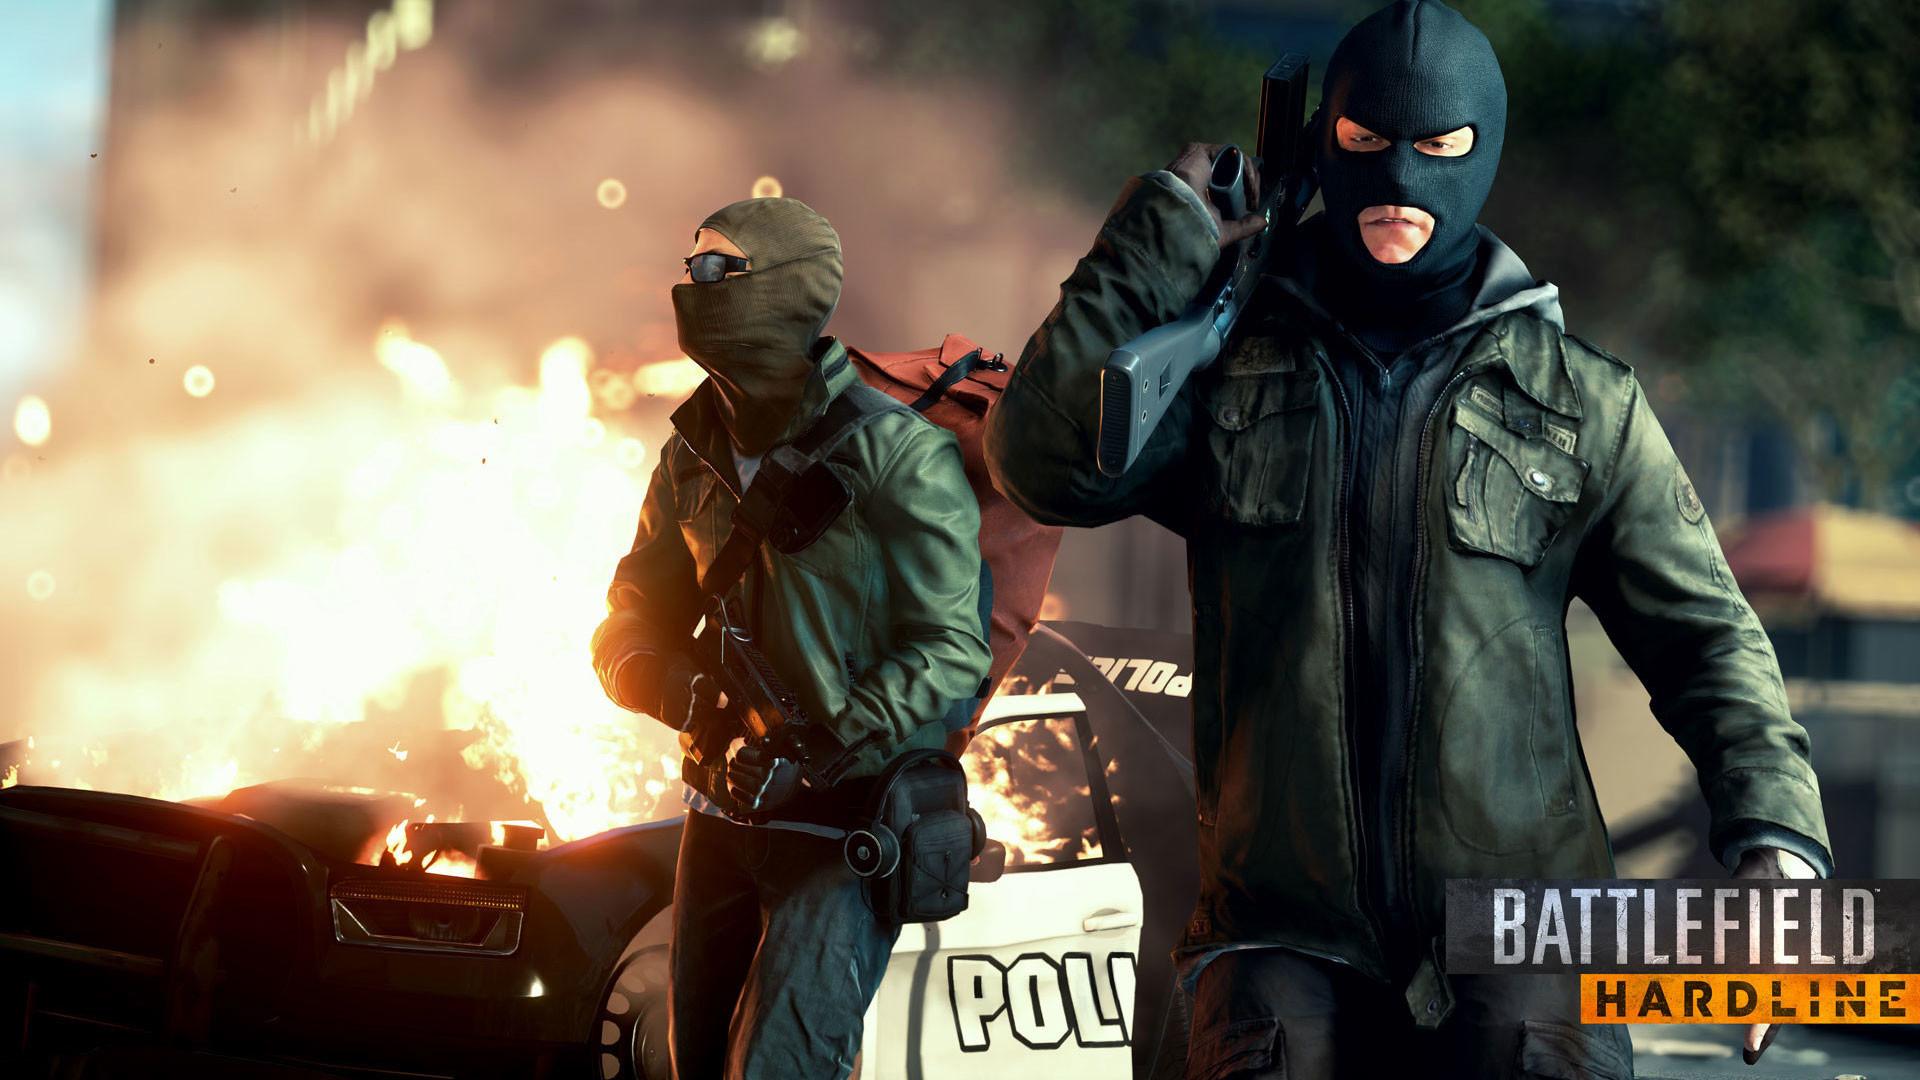 Battlefield Hardline – Gangsters wallpaper